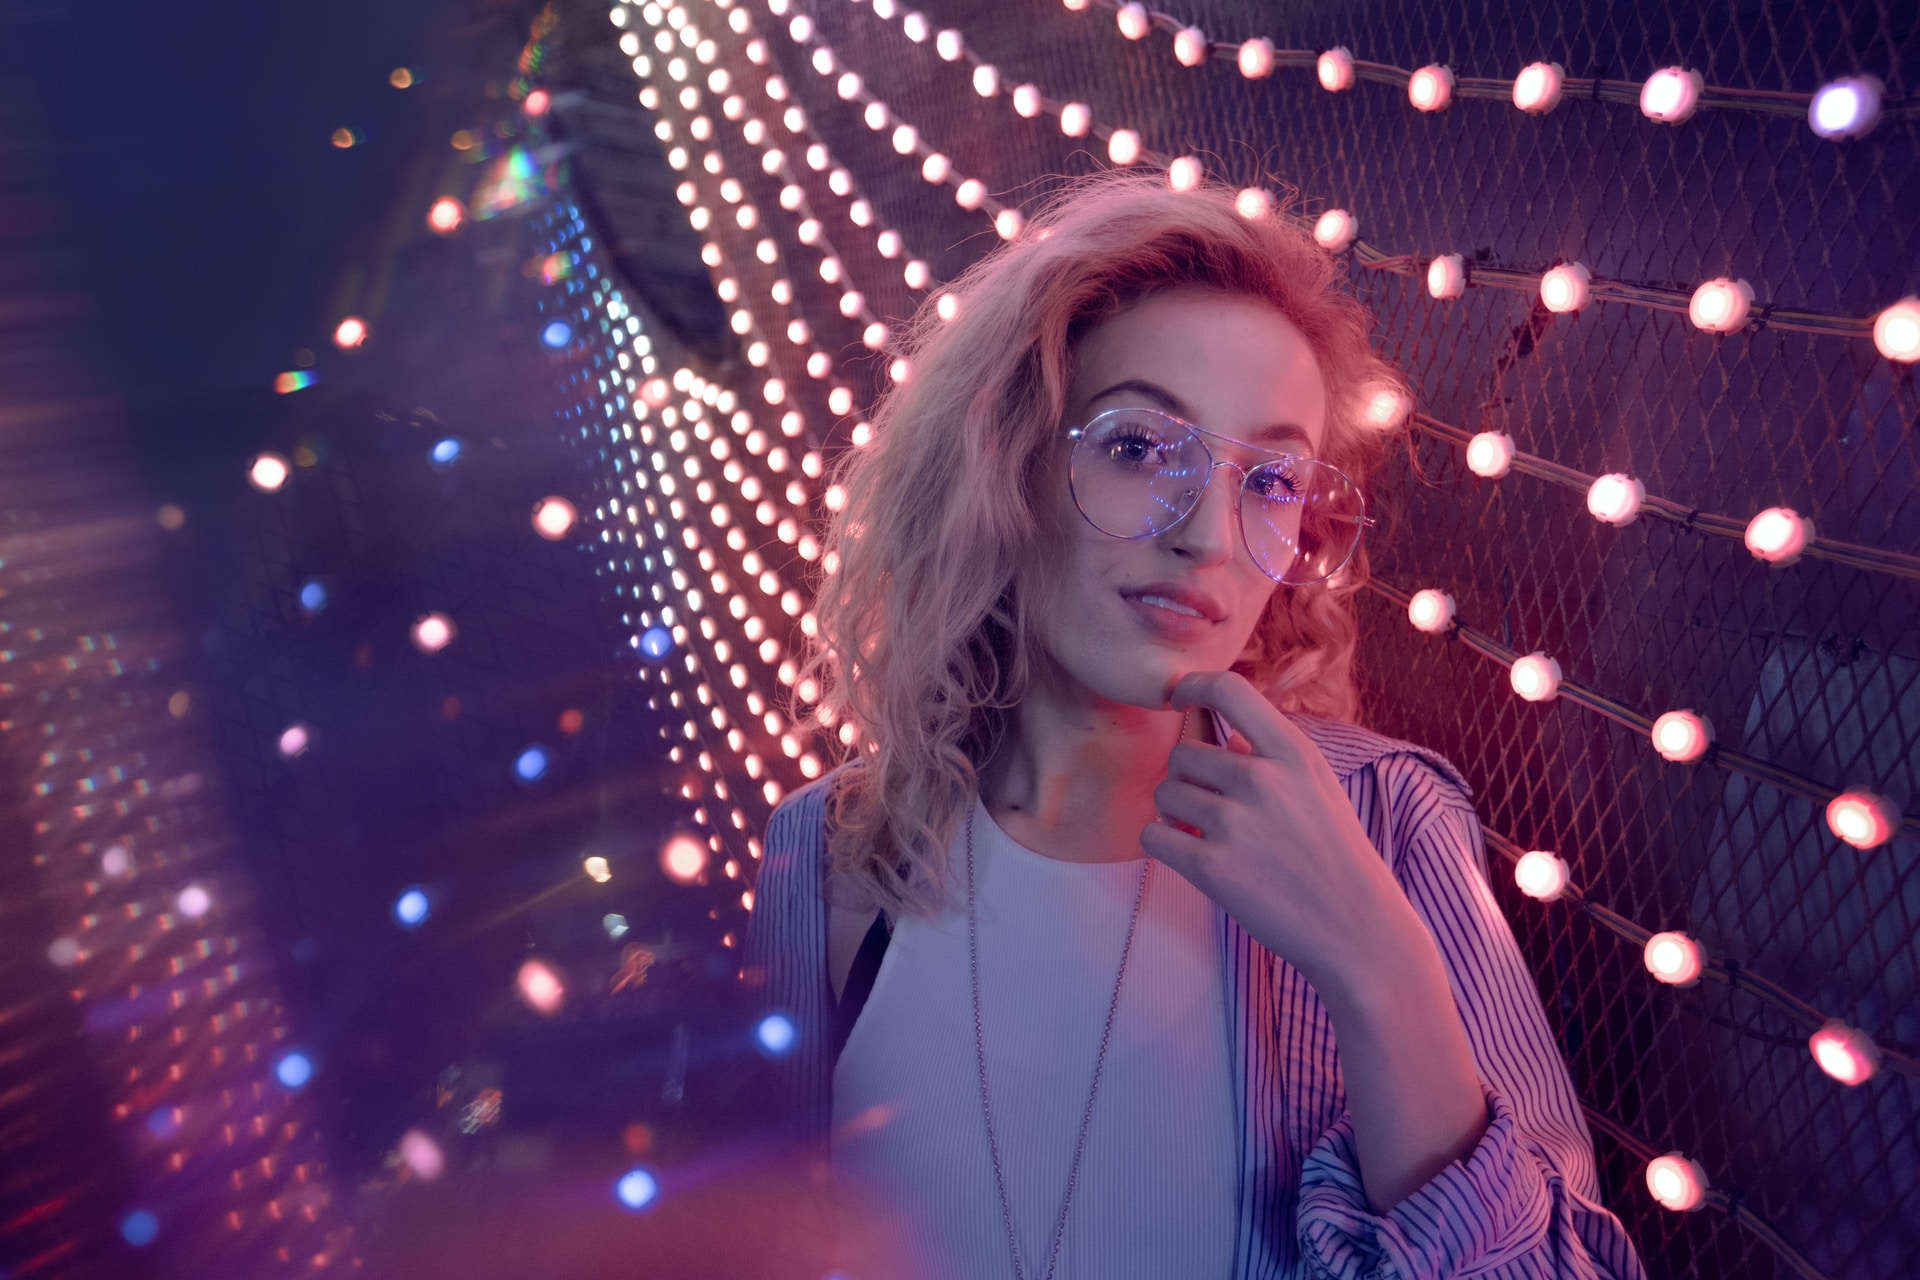 woman standing near string lights